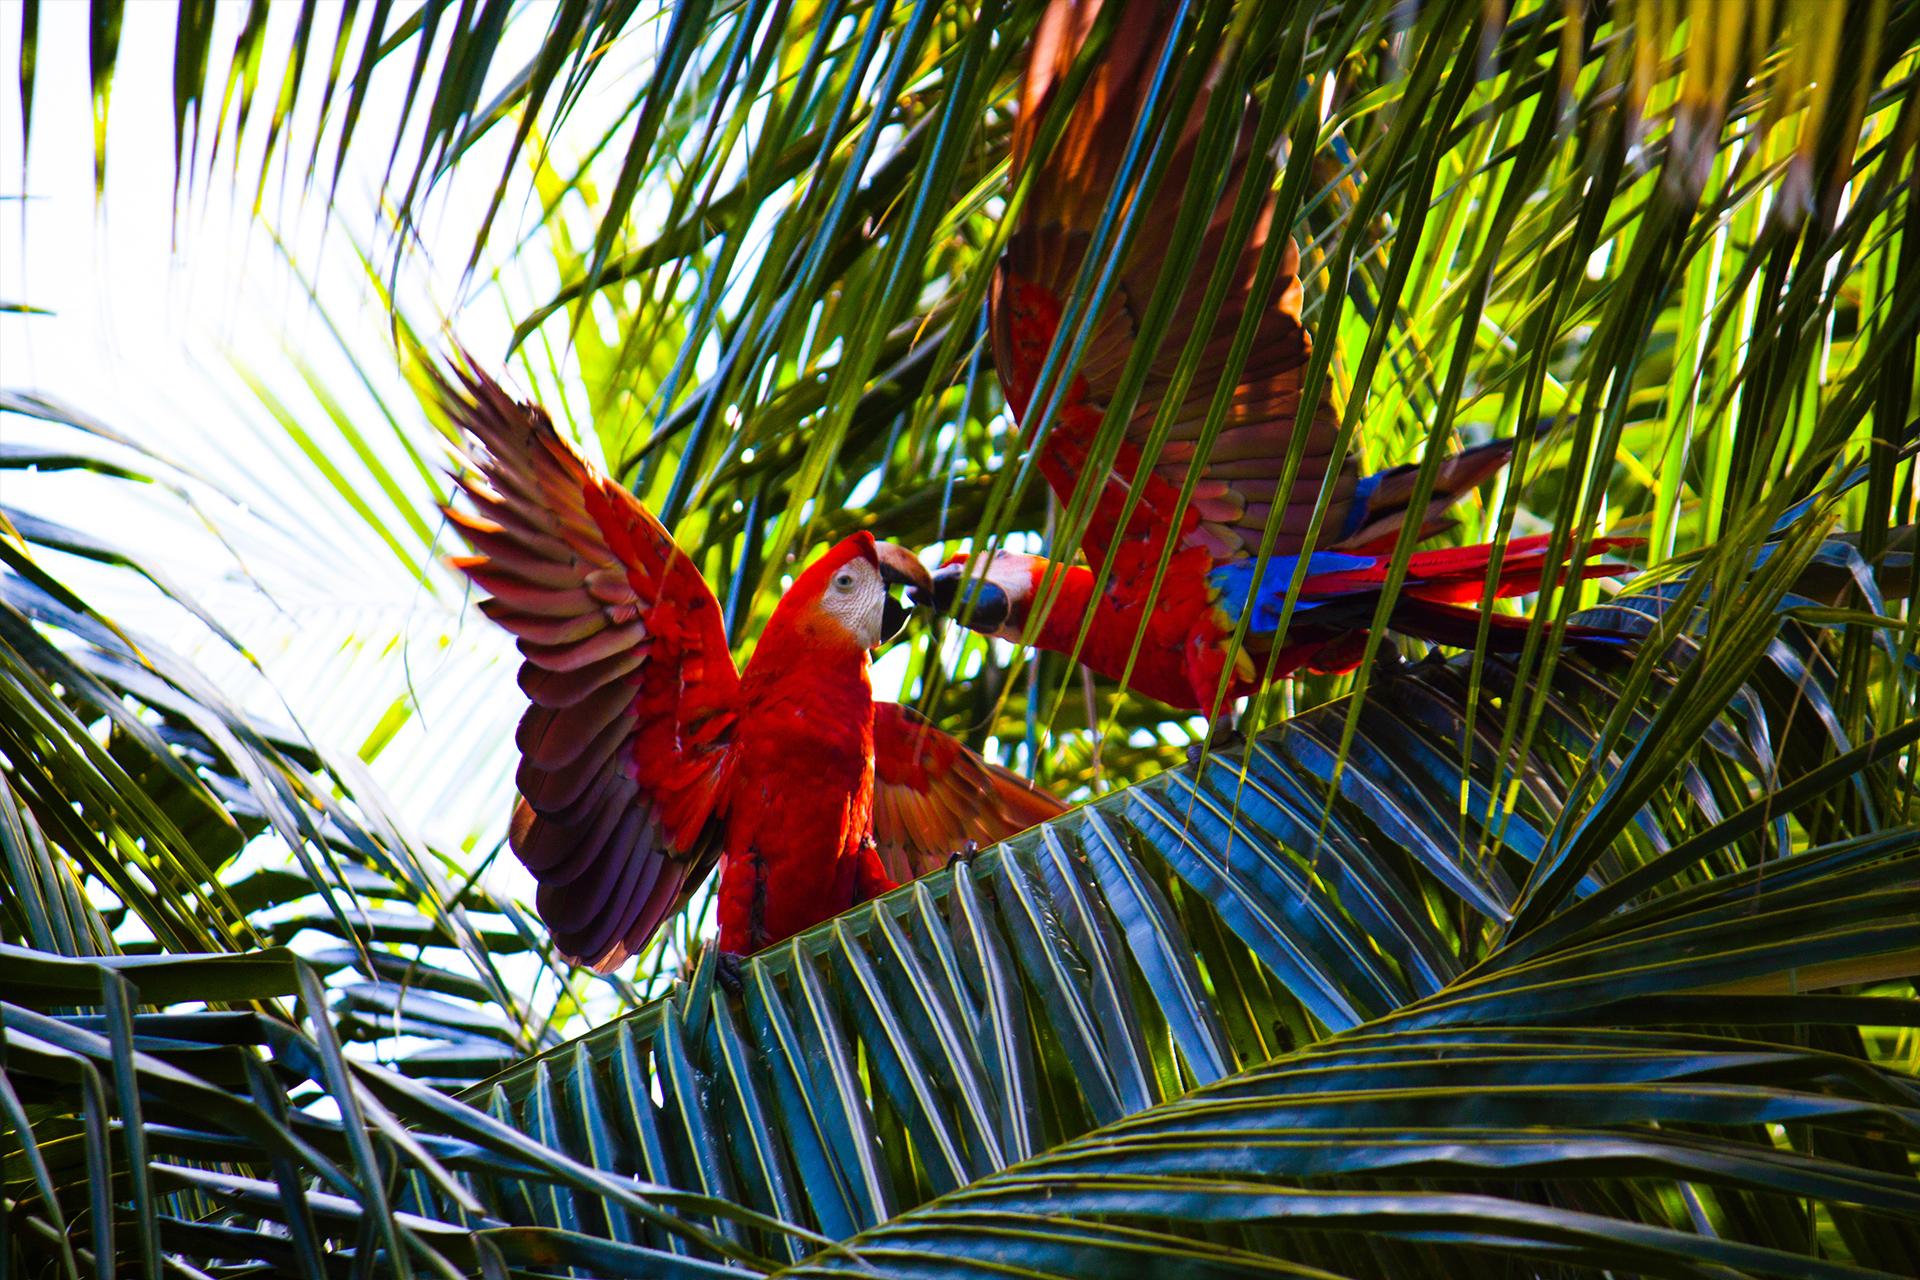 natureza-rio-de-janeiro-brasil